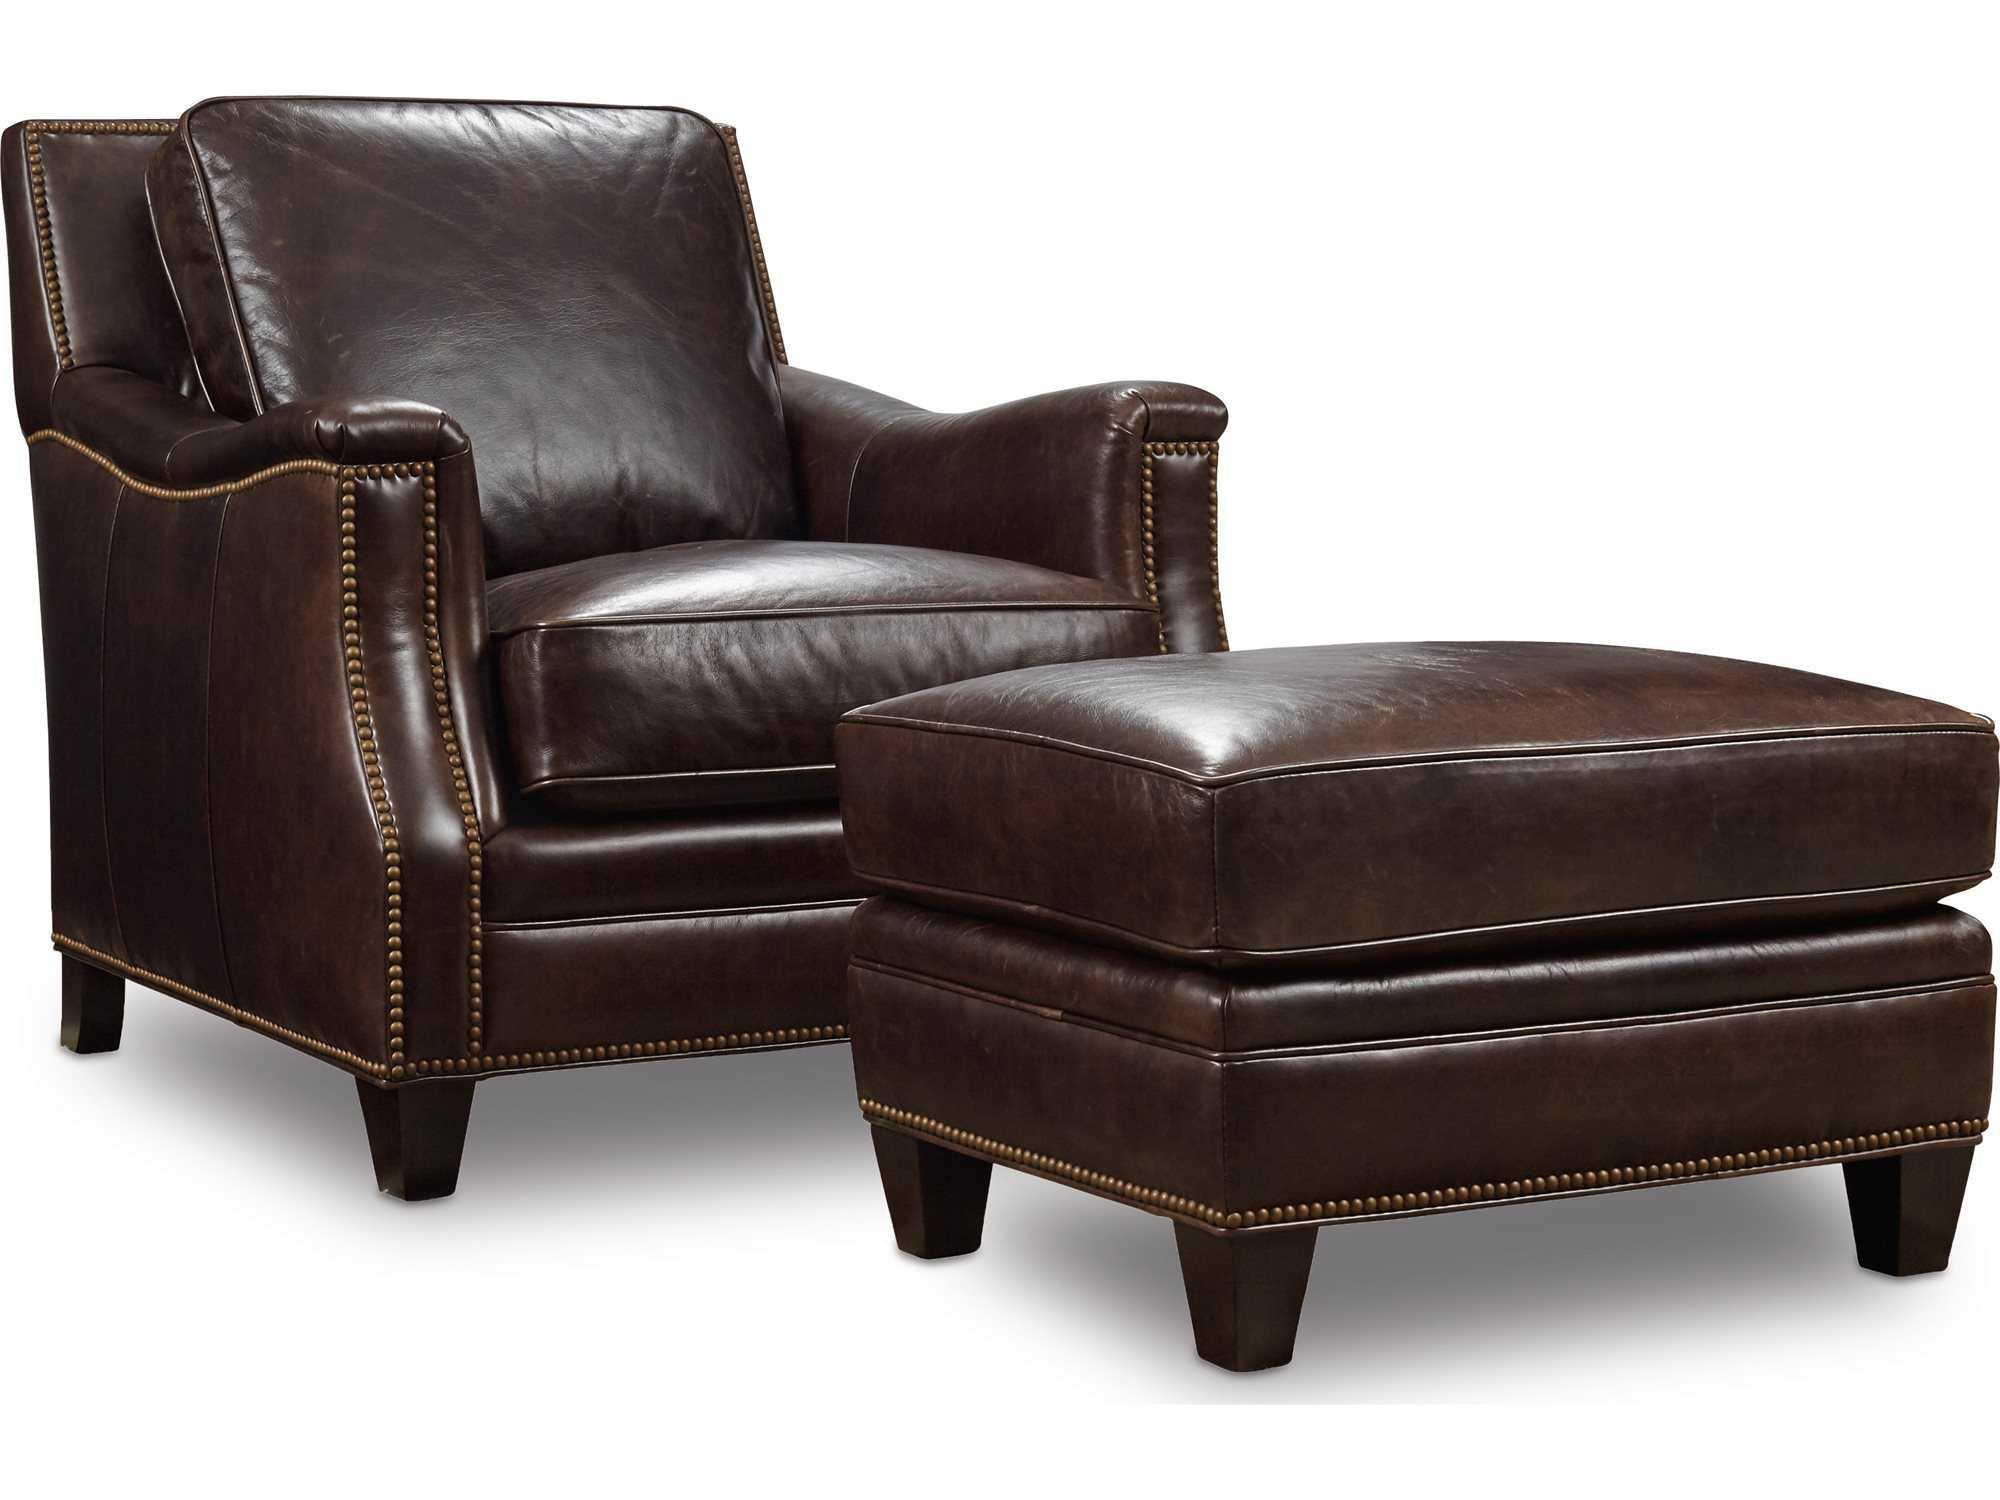 Hooker Furniture Huntington Colleis Chair and Ottoman Set  : HOOSS35101088SET1zm from www.luxedecor.com size 2000 x 1500 jpeg 124kB